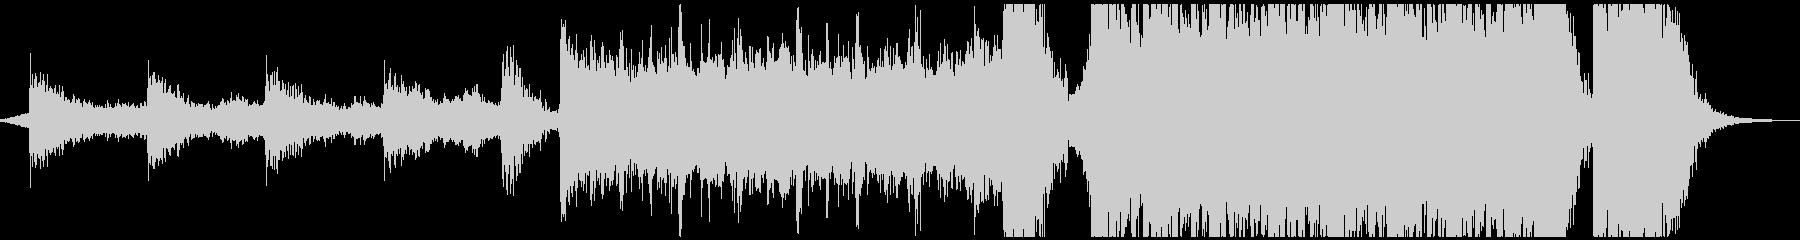 Damage IIの未再生の波形